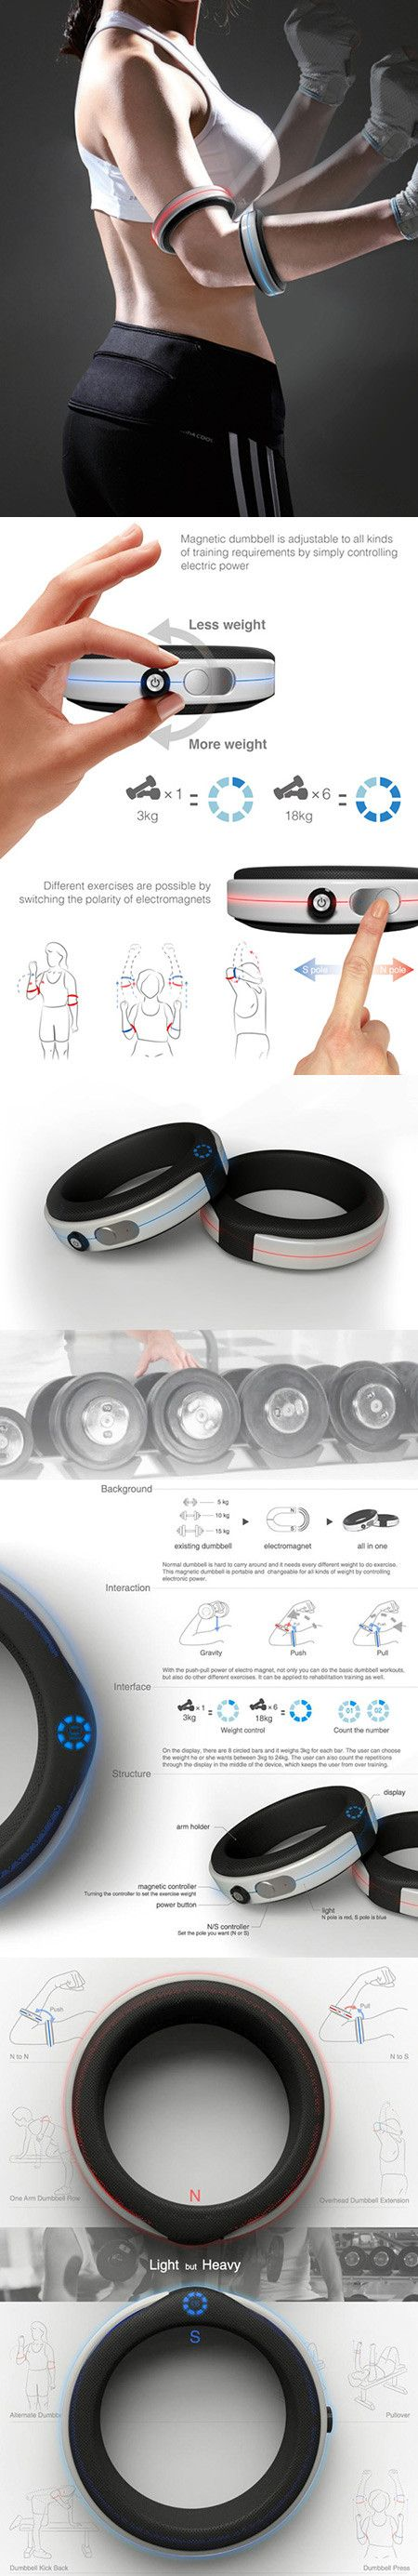 O2 Magnetic Dumbbells Can Be Worn Like Bracelets, Adjustable to 52-Pounds - TechEBlog